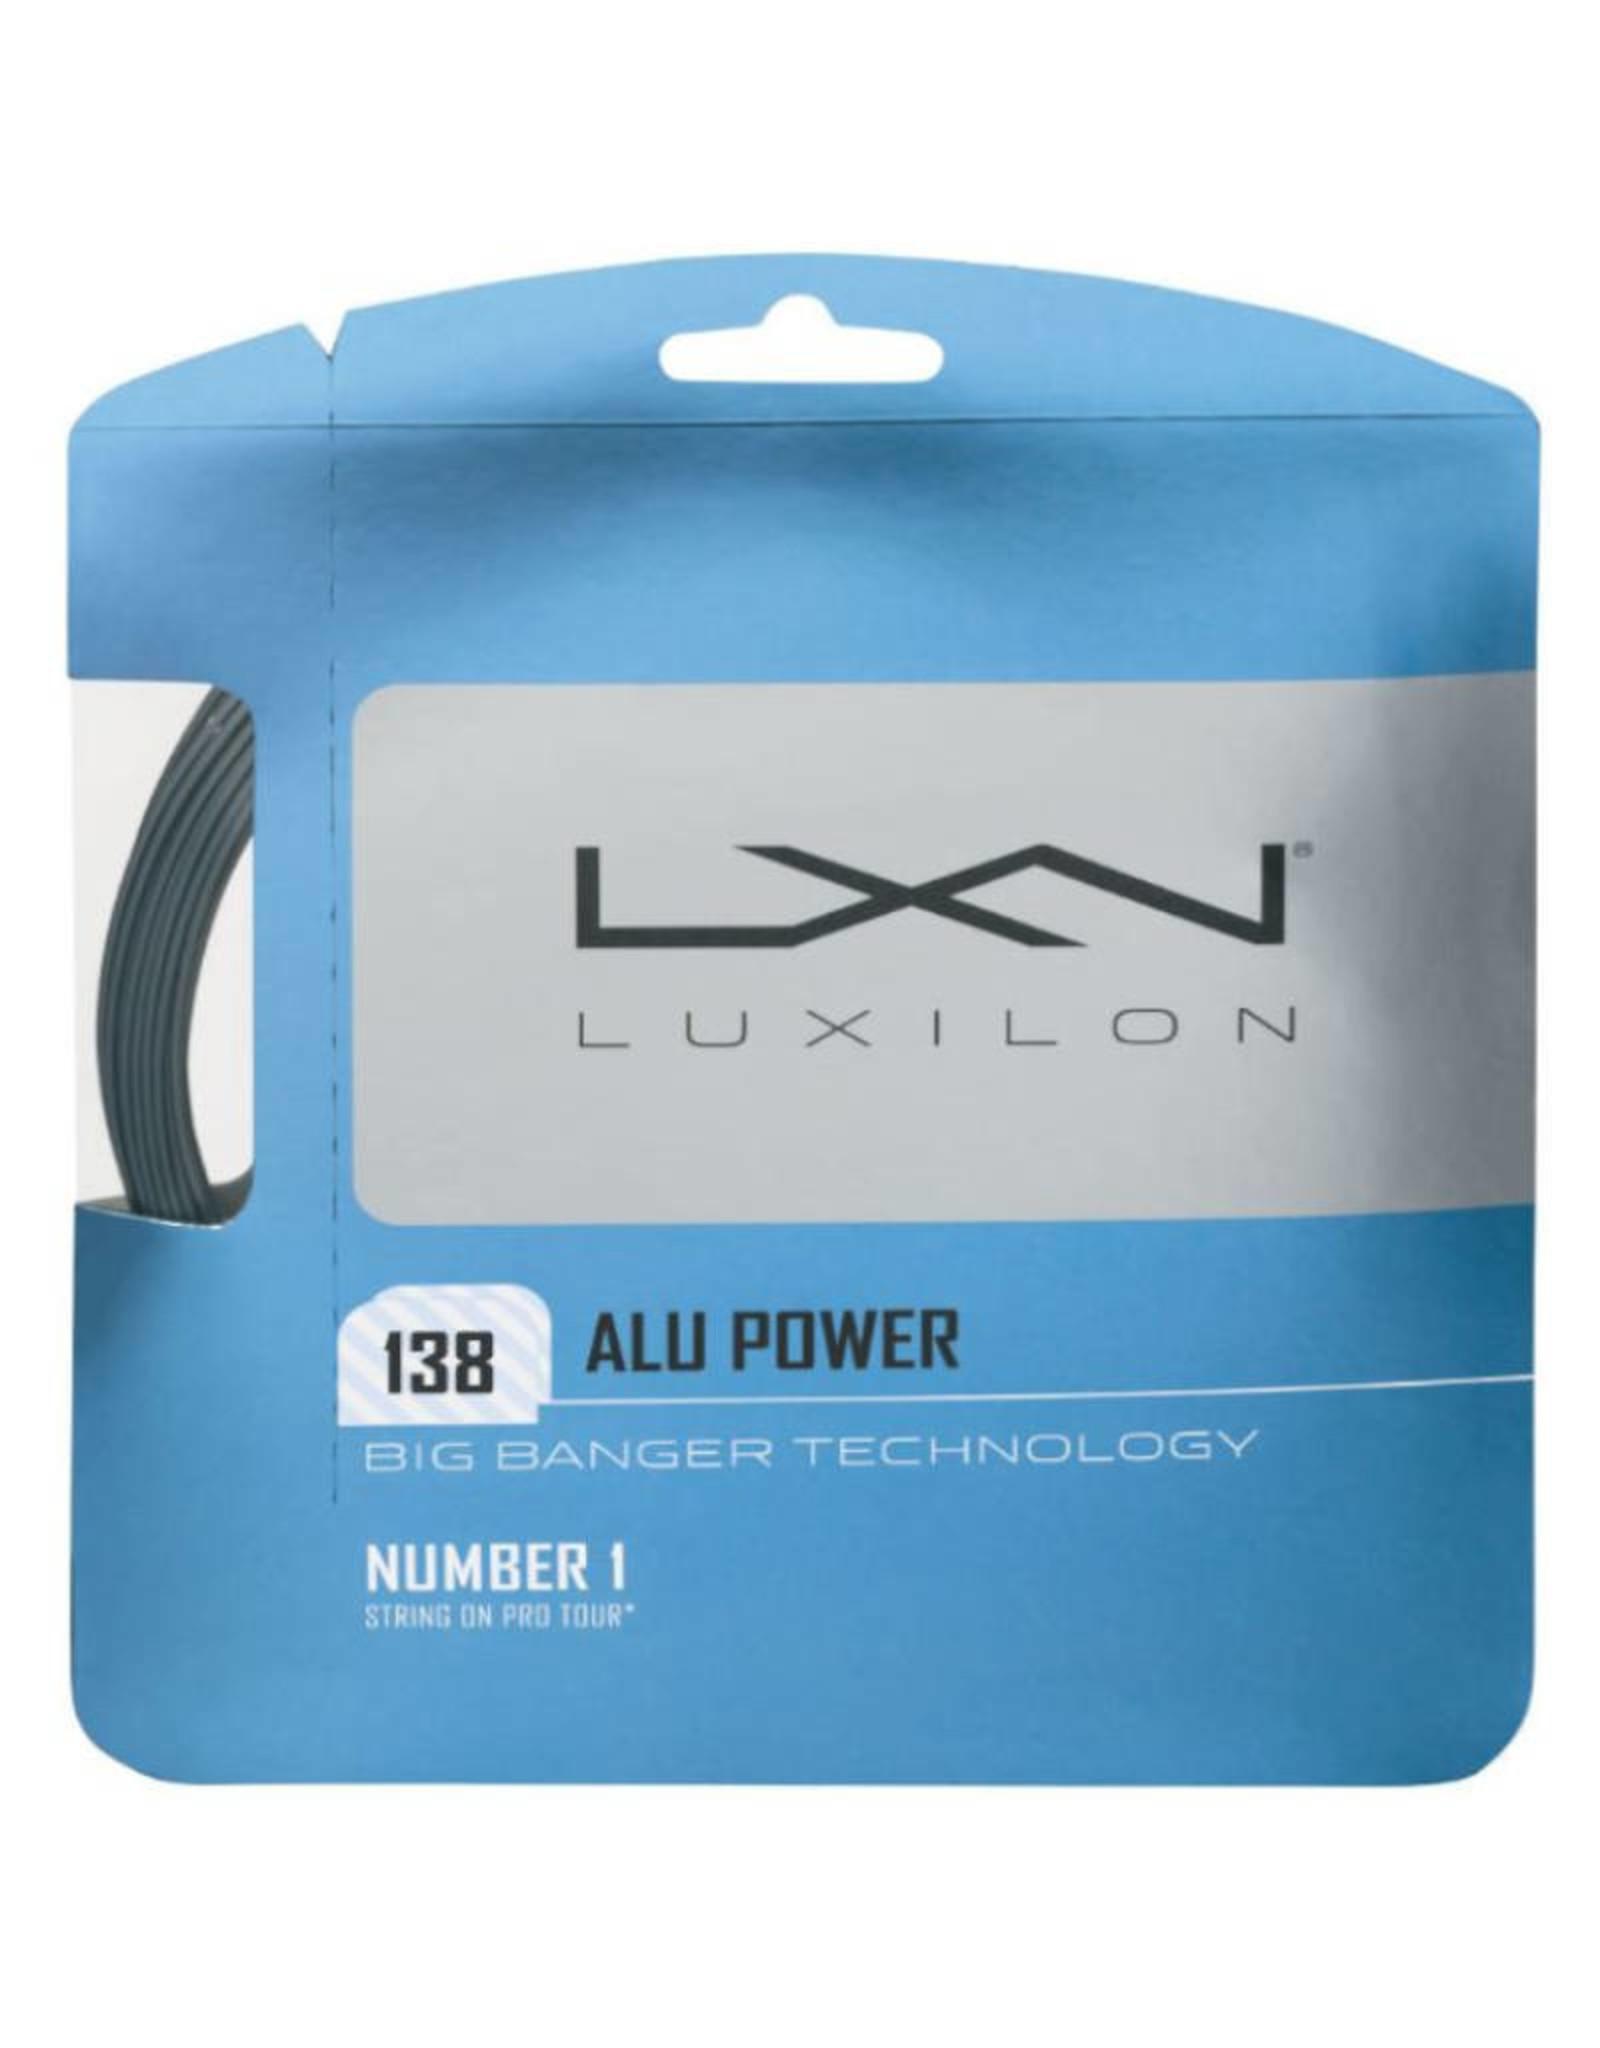 LUXILON ALU POWER 138 FULL SET